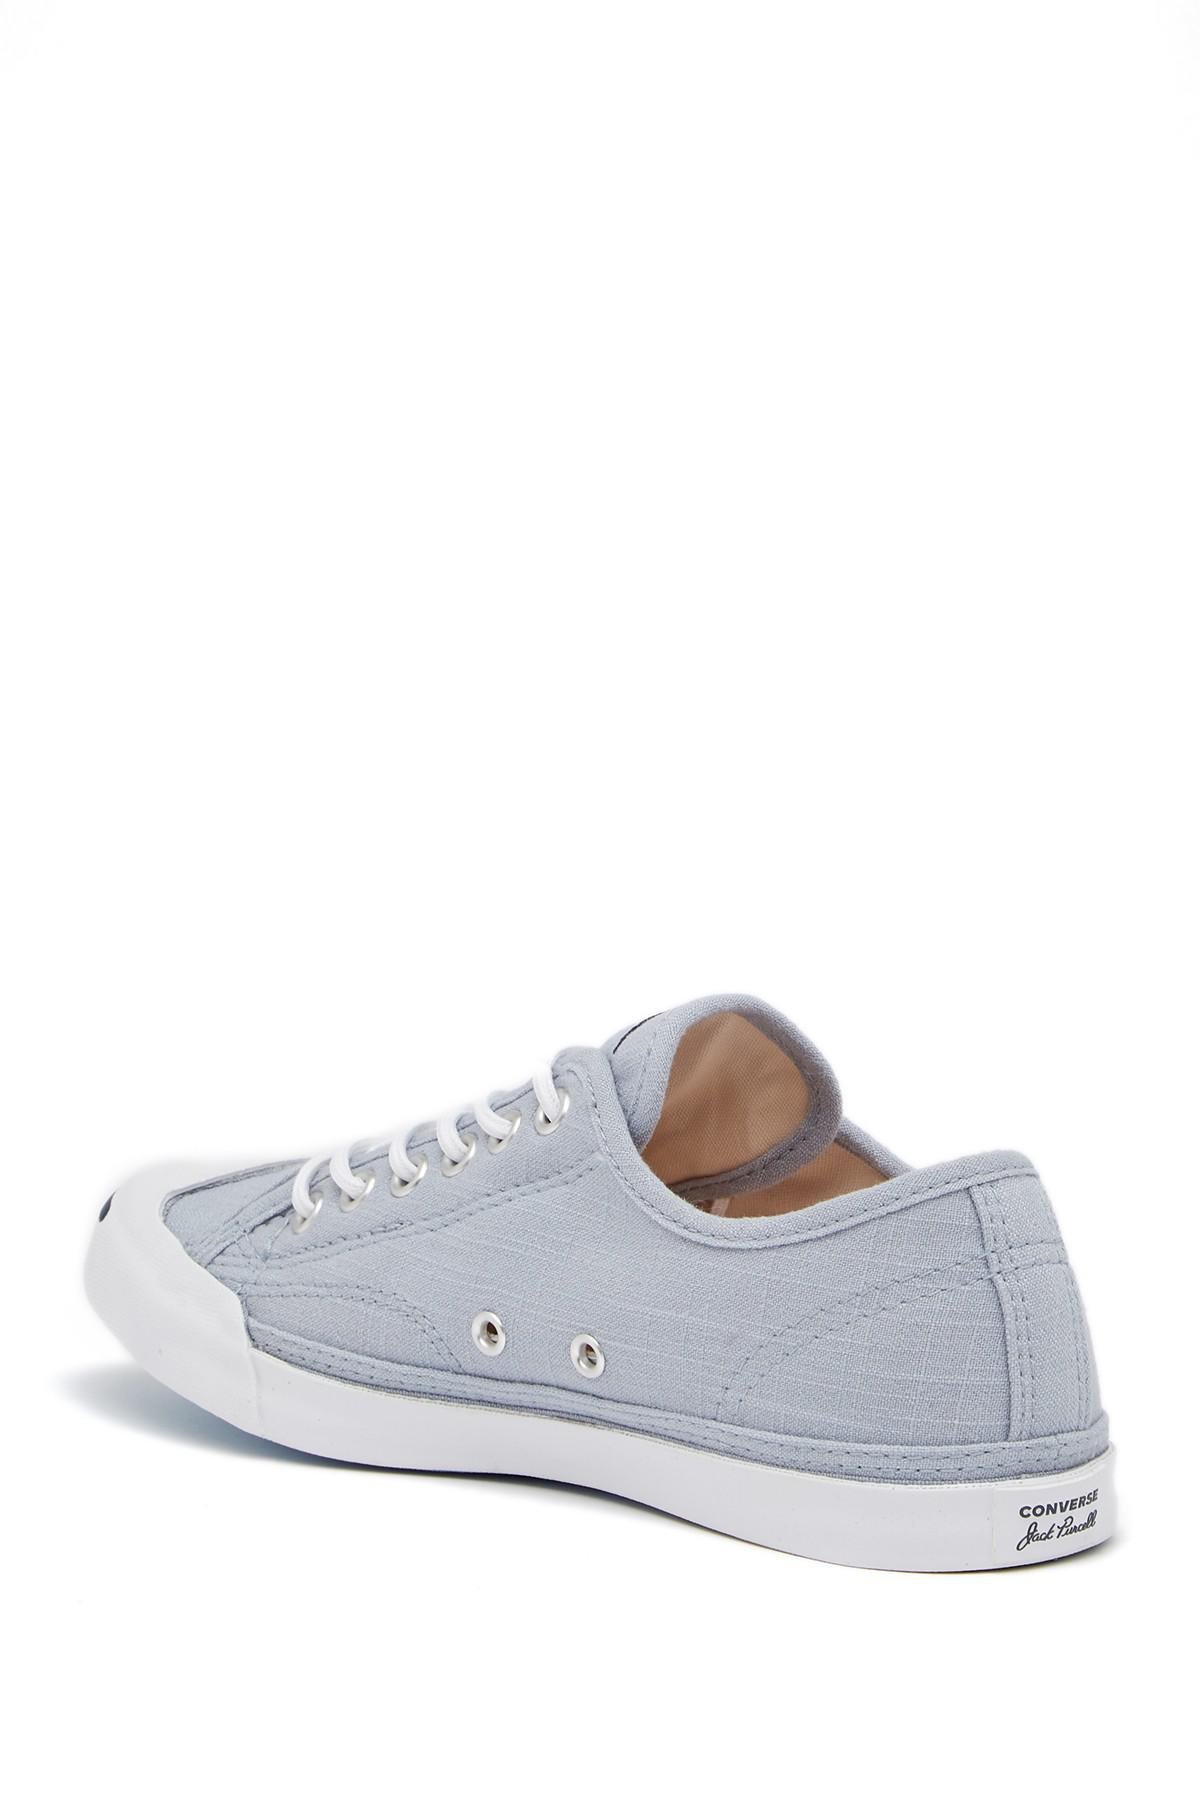 Converse Jack Purcell Oxford Blue Granite Sneaker (Women) imr3PF